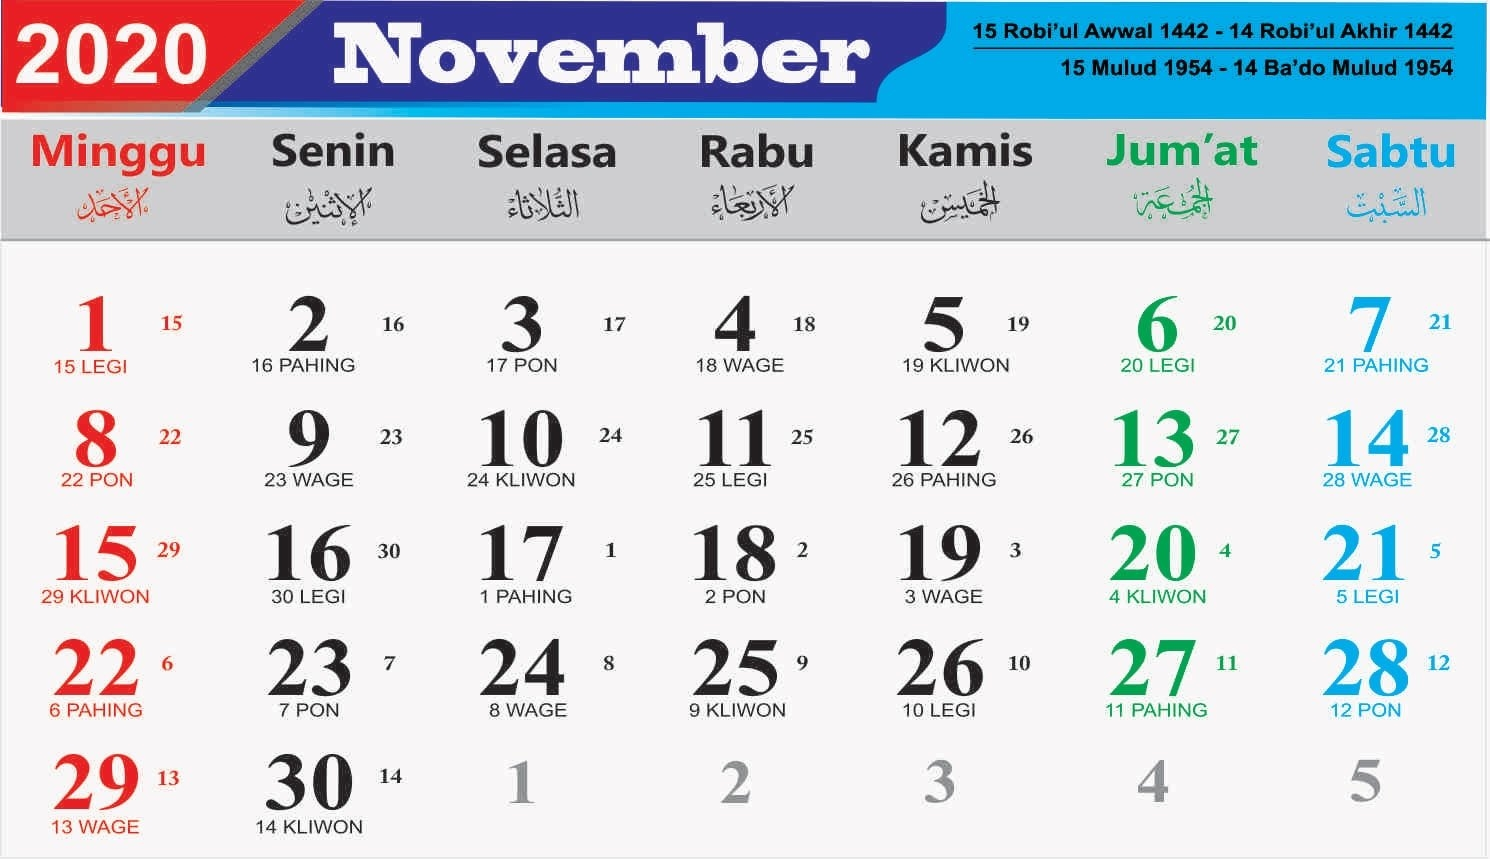 November 2020 Bulan Islam | Get Free Calendar with regard to Kalender Islam 2021 Malaysia